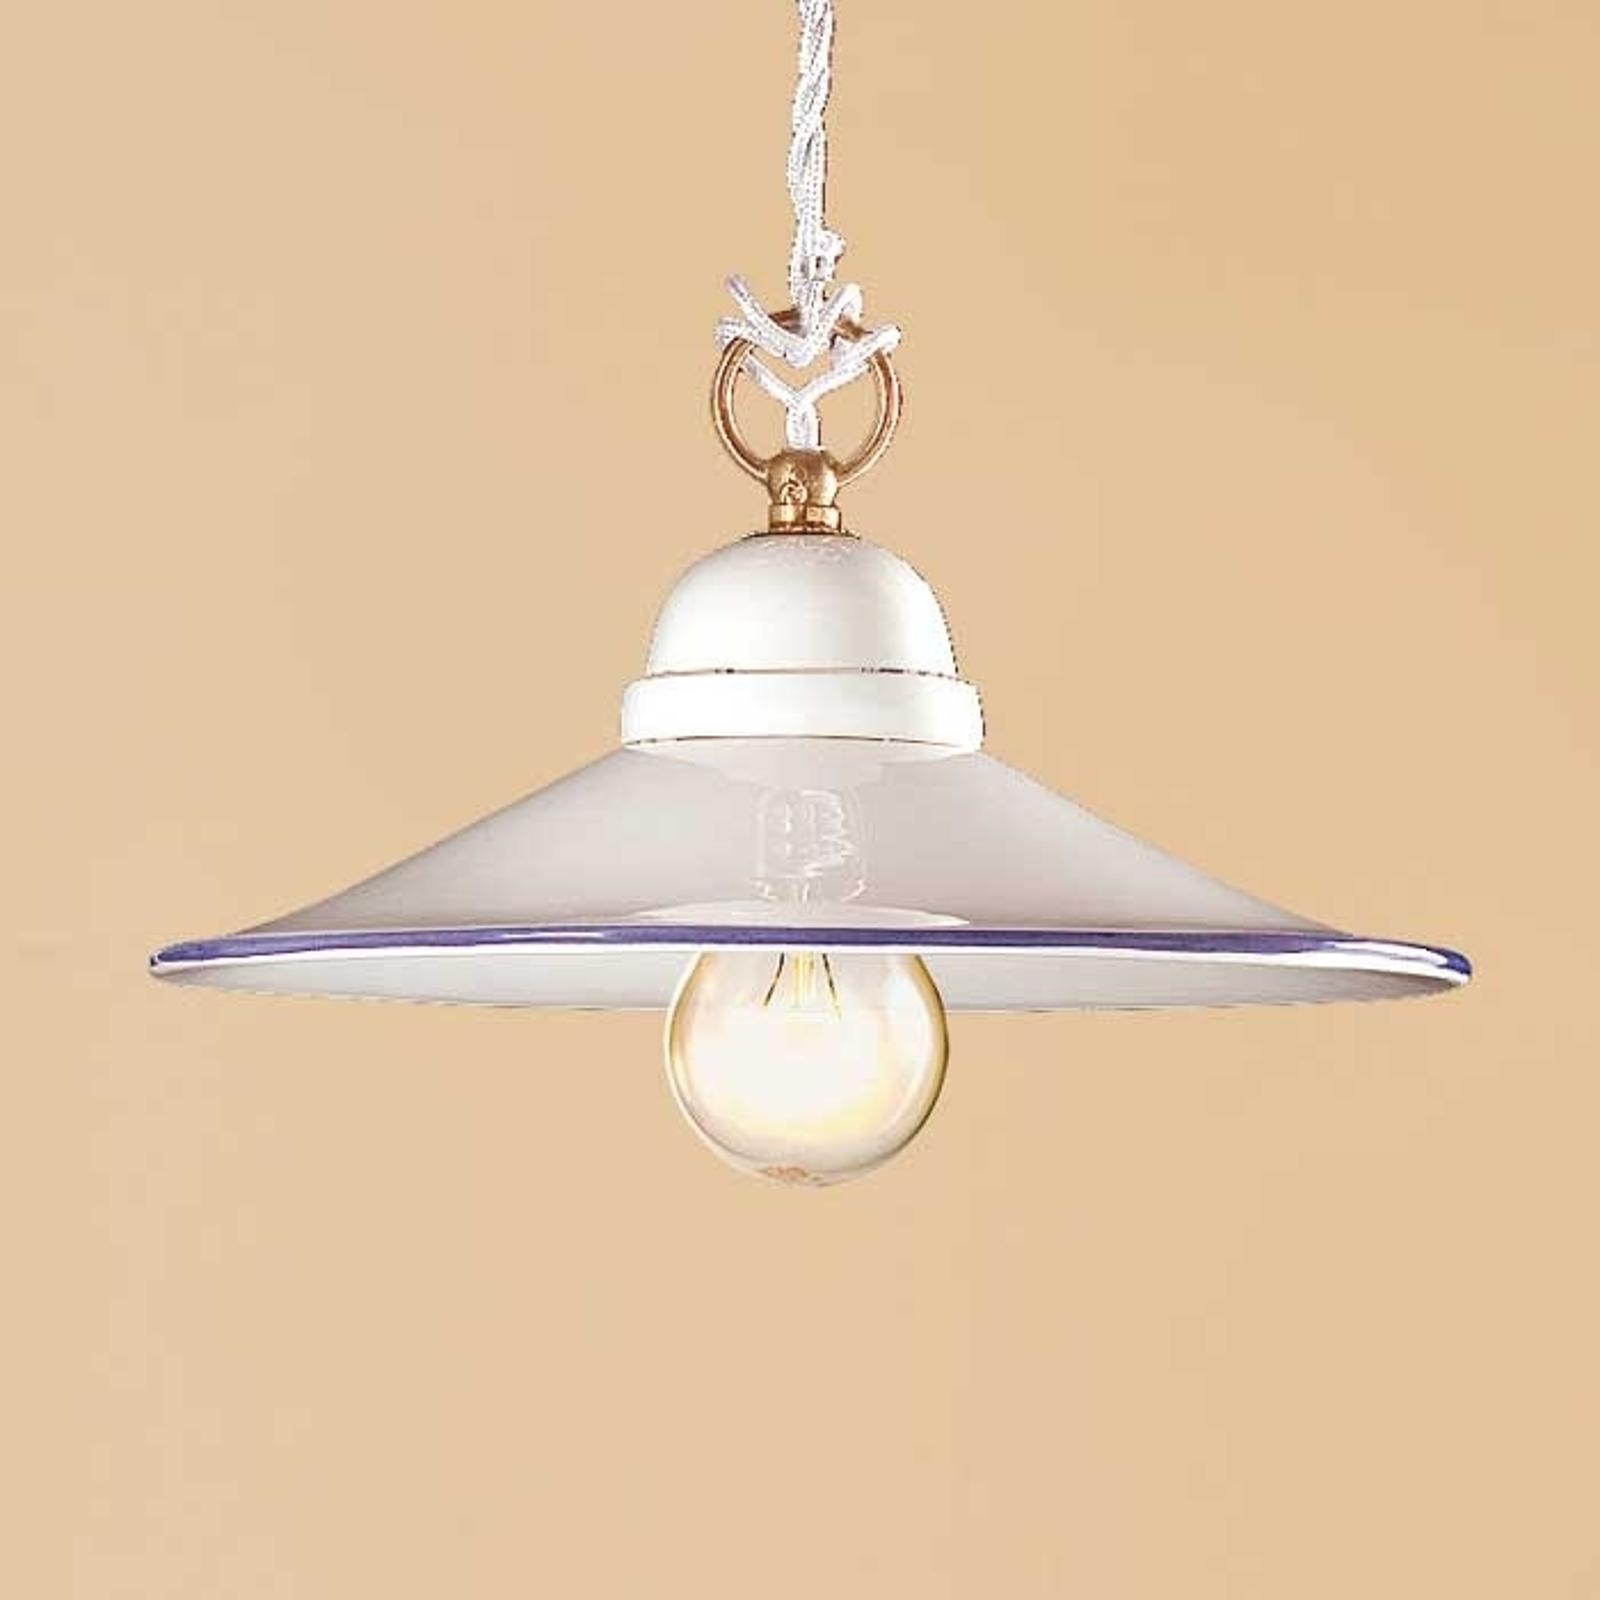 Smuk hængelampe PIATTO i keramik, 28 cm